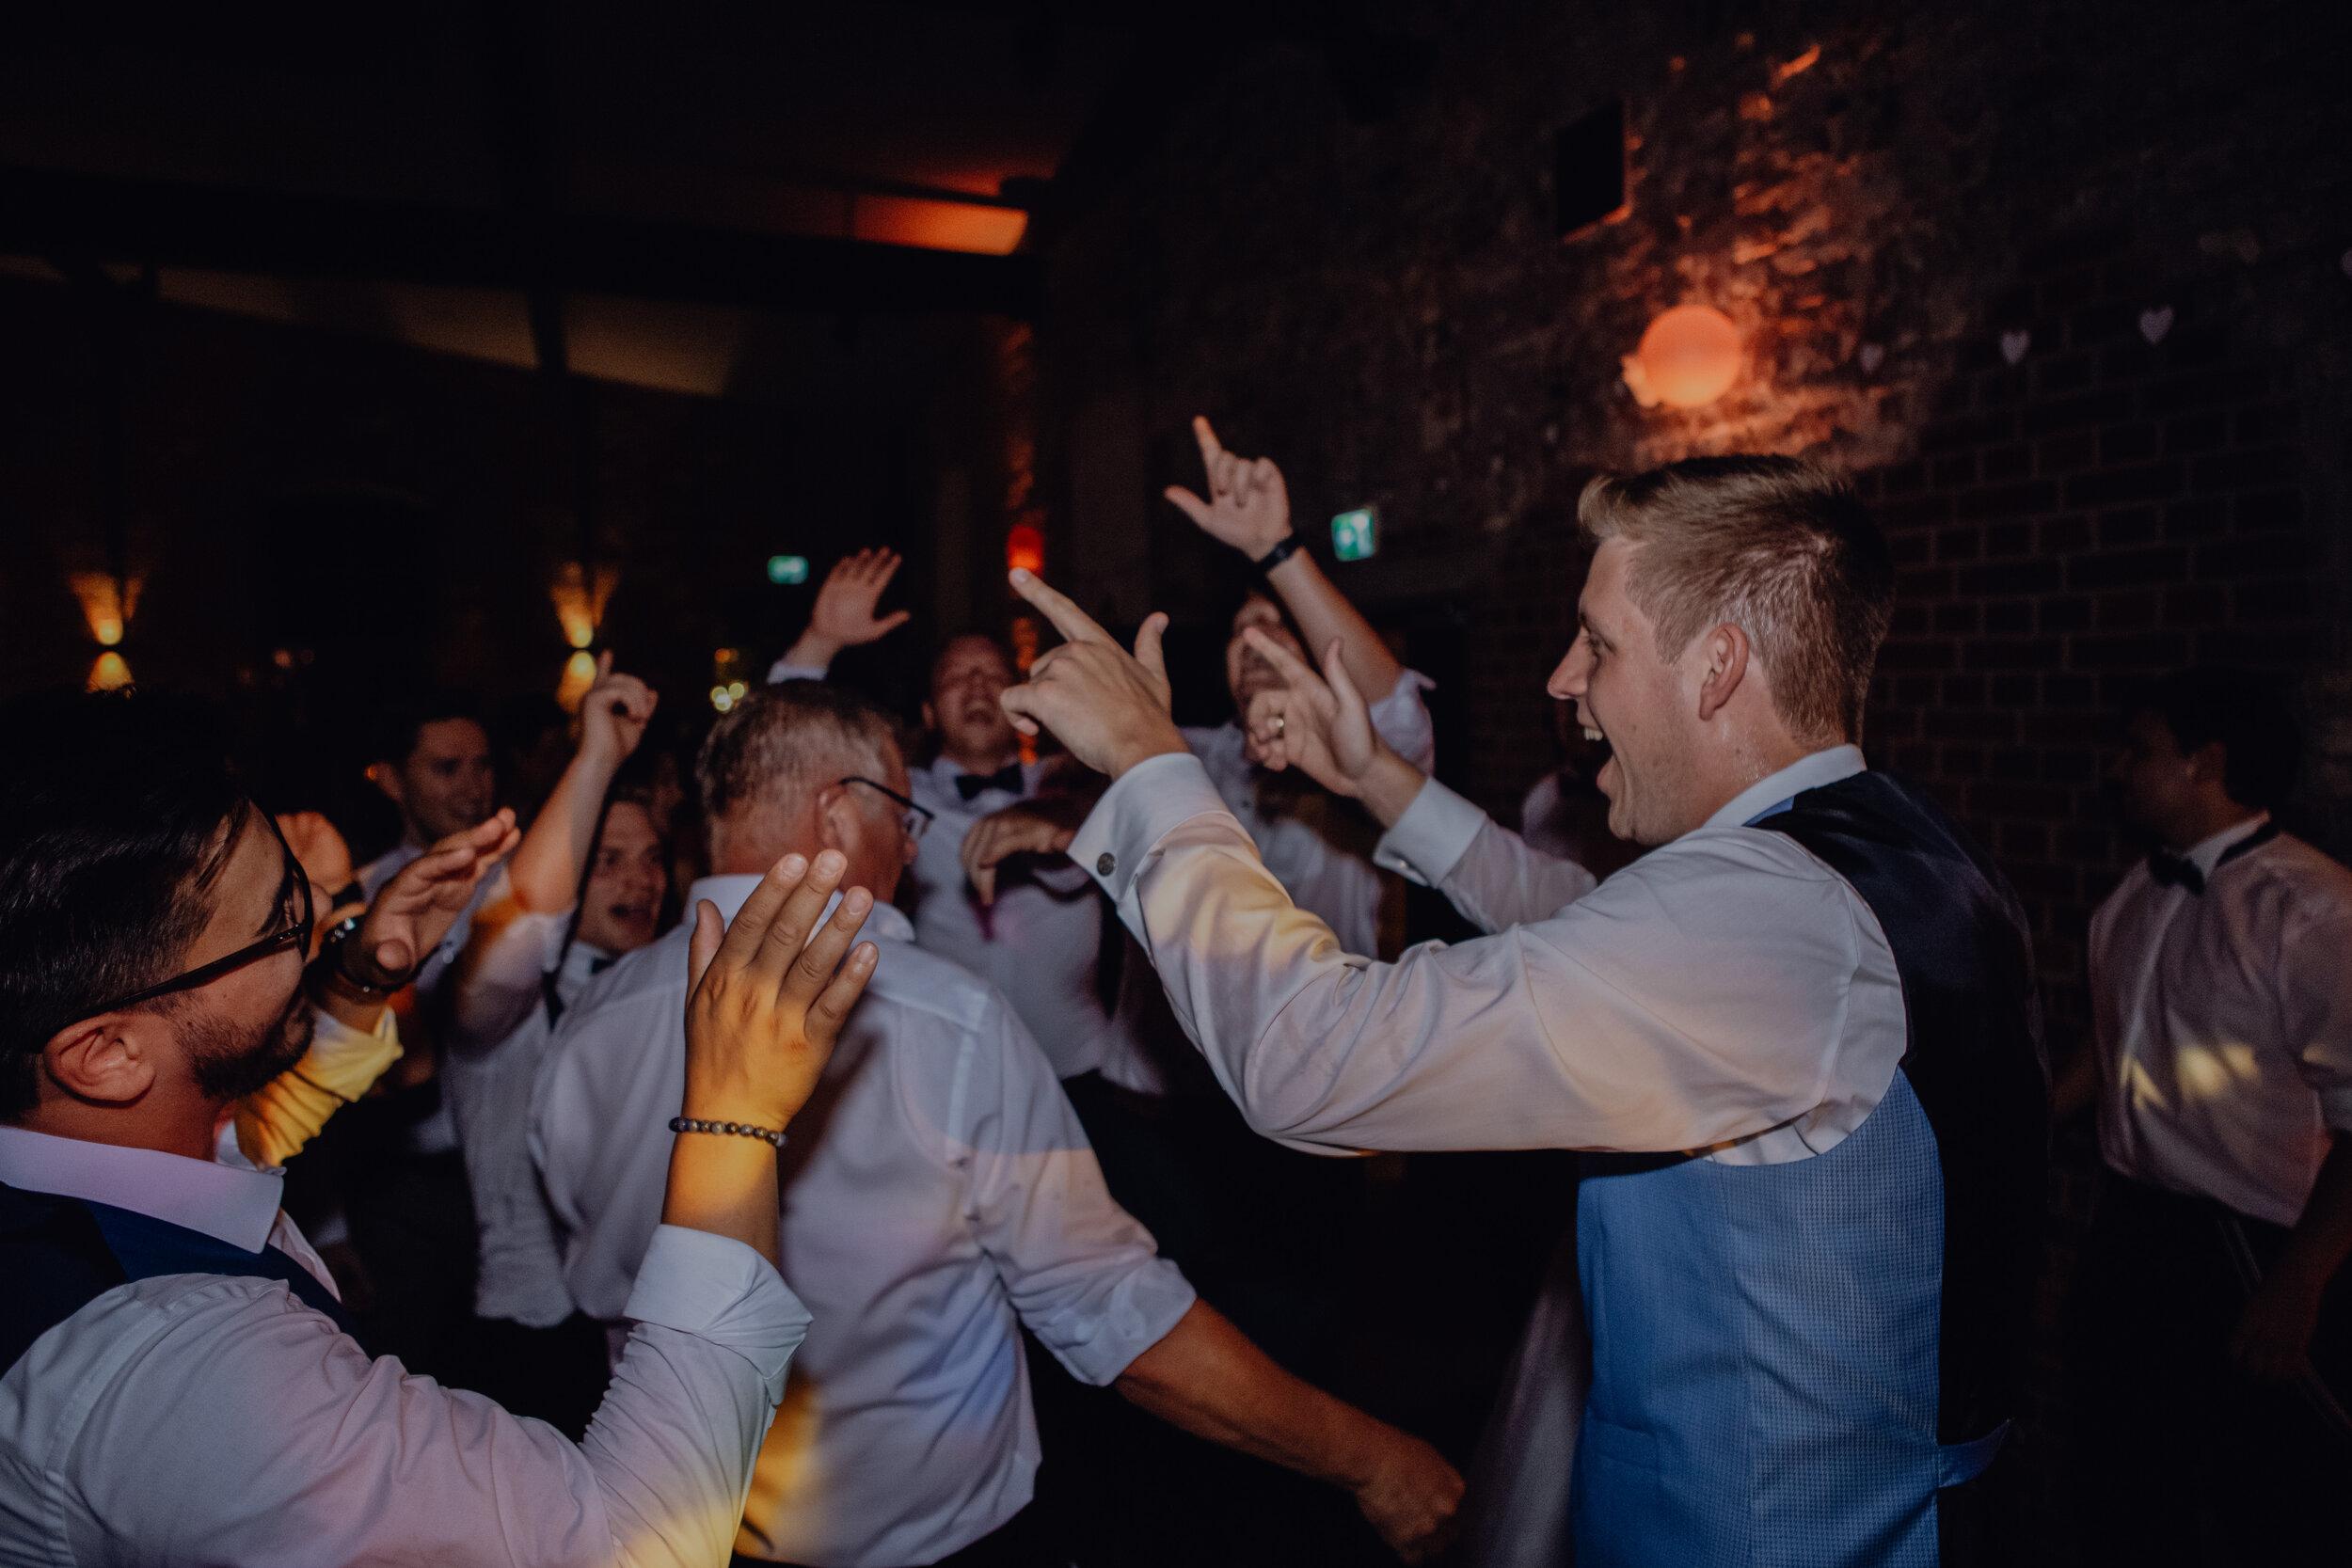 Hochzeit_Party_LED.jpg